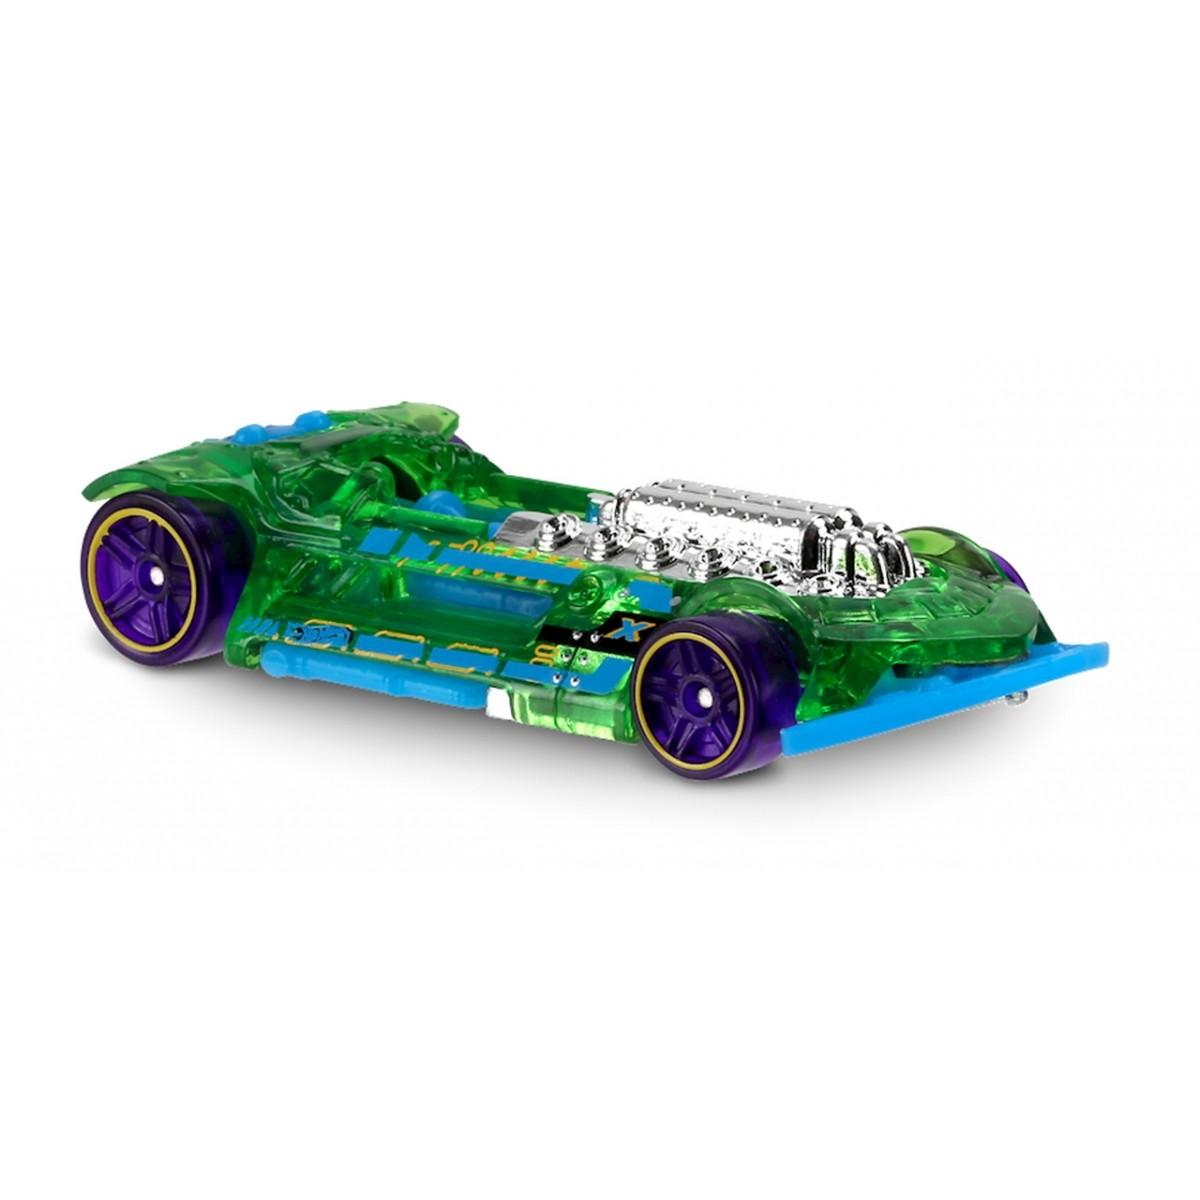 Carrinho Hot Wheels: X-Steam Verde